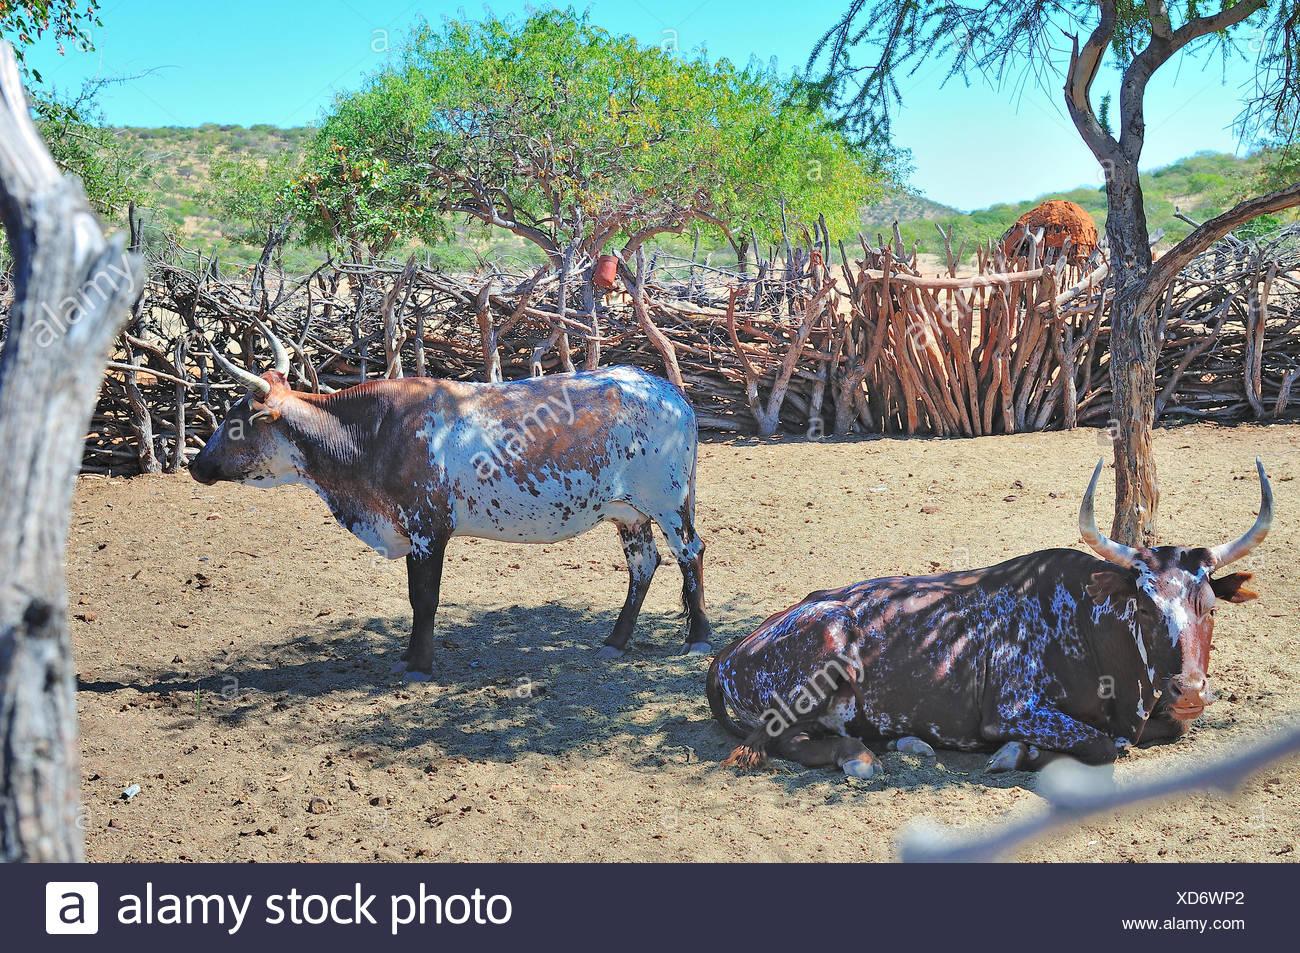 Nguni cattle in an Ovahimba kraal - Stock Image